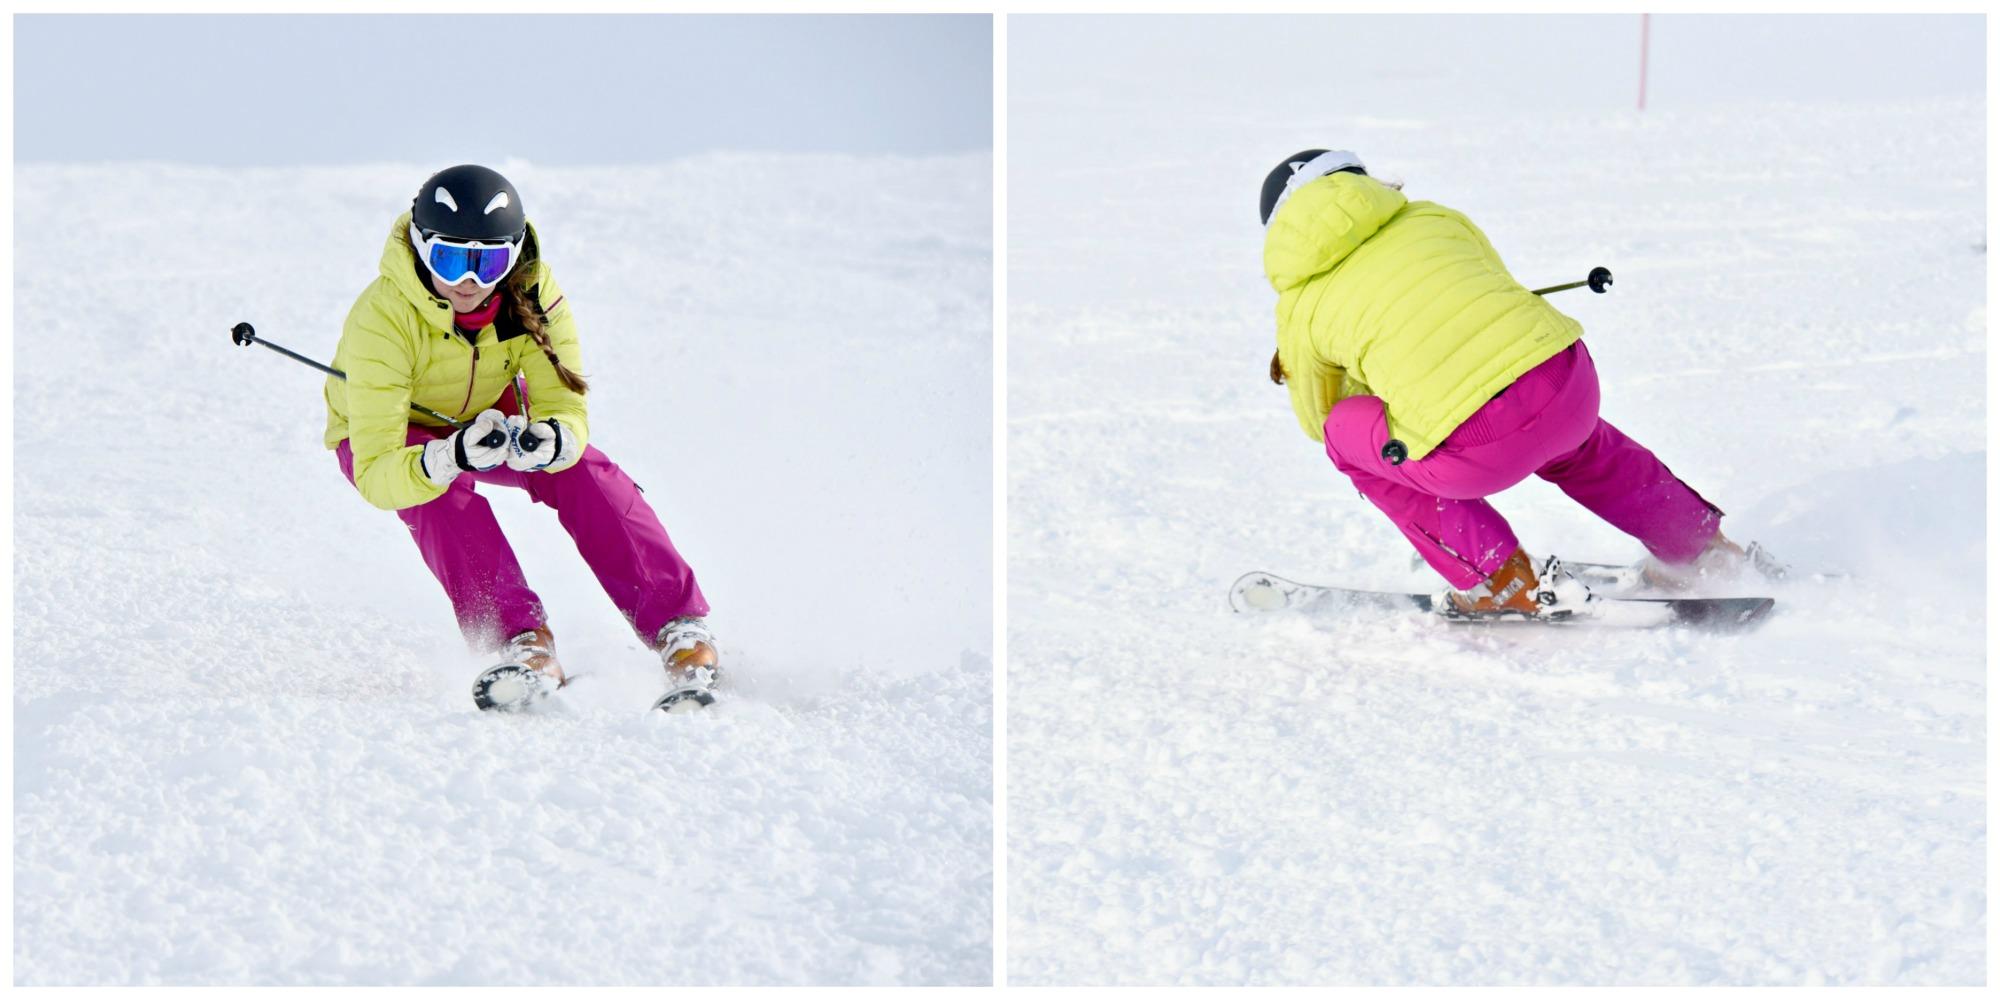 Fitnessblog-kästle-ski-klara-fuchs-österreich-blogger-sport-winter26-collage